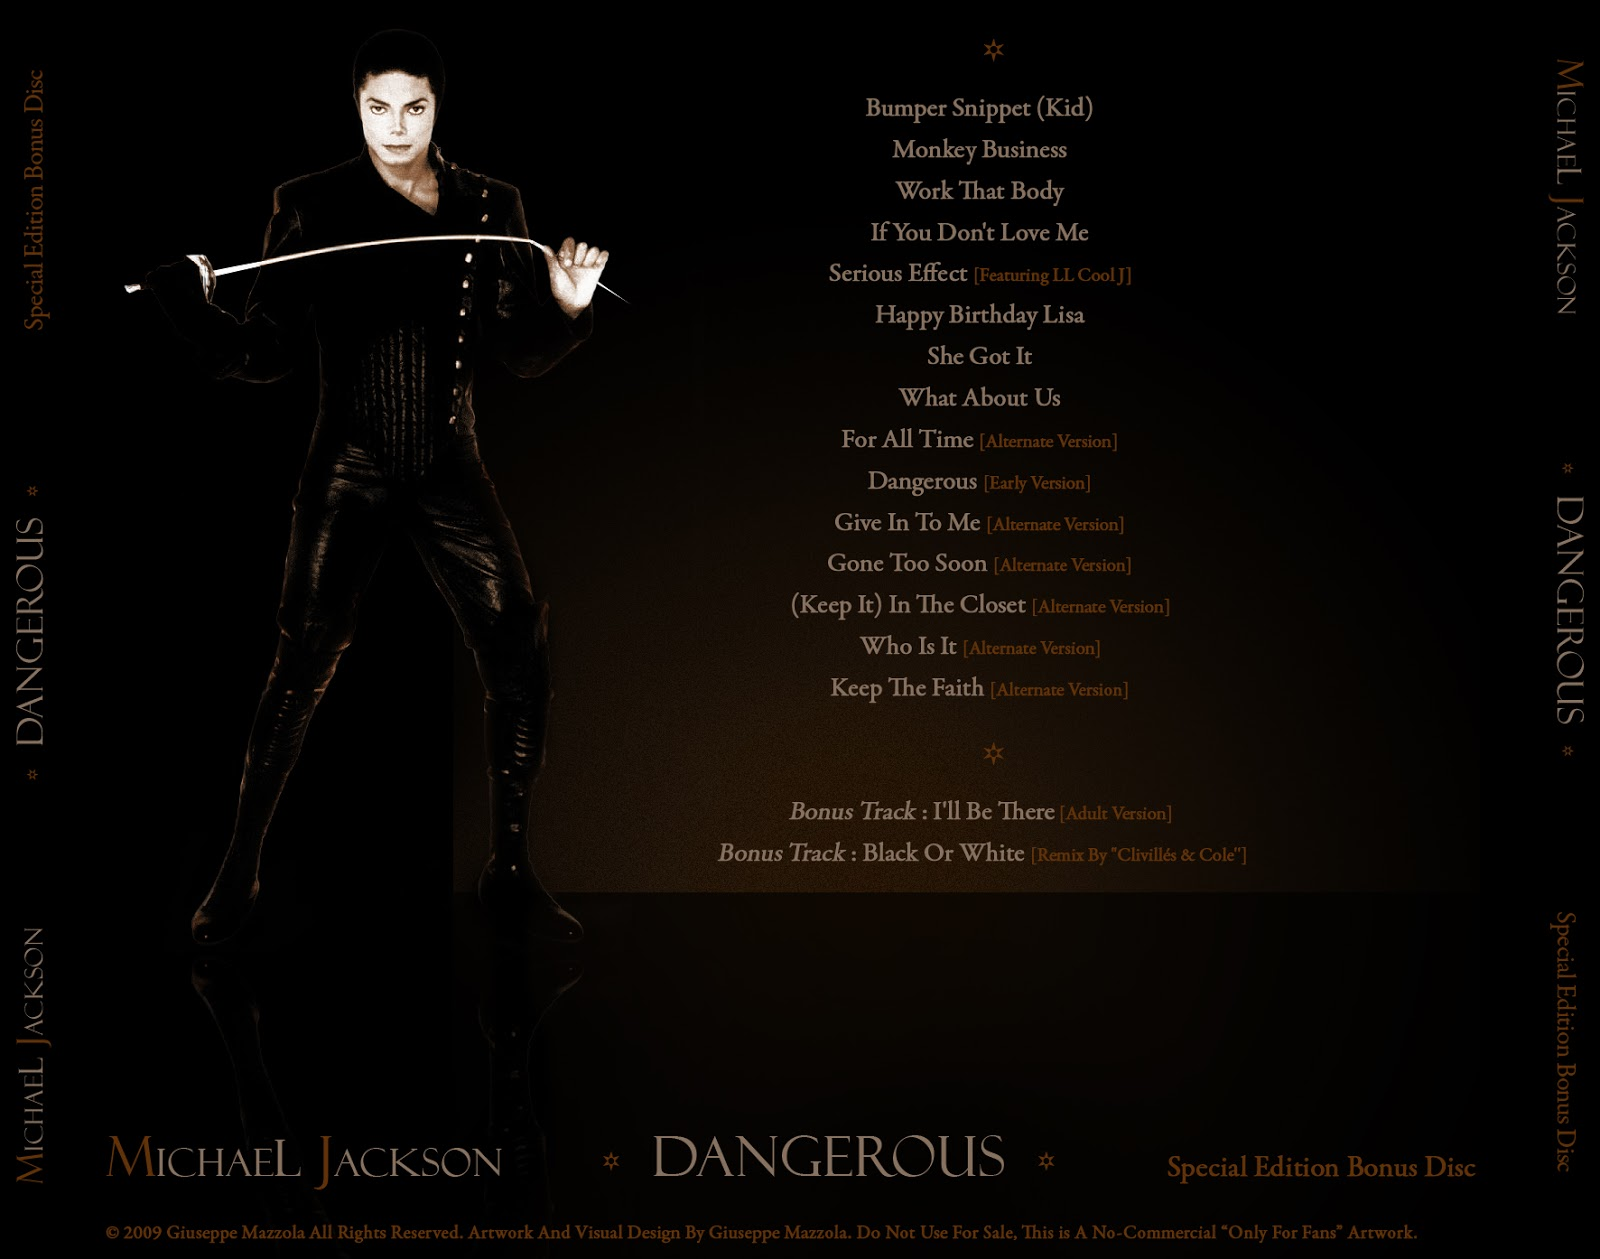 Despatch x 2 unreleased albums